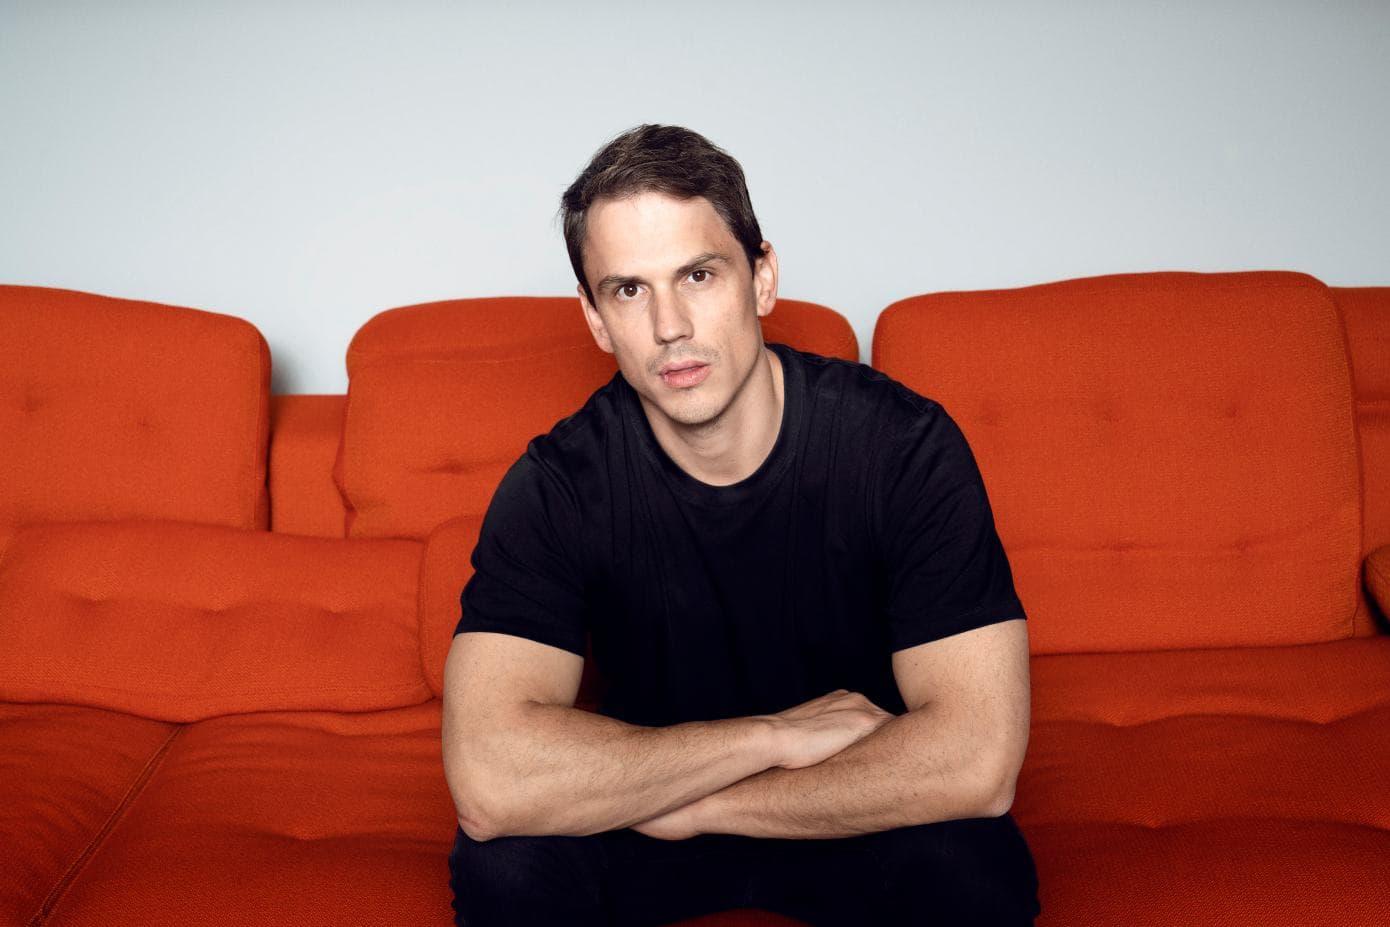 Techcrunch: German insurtech startup Getsafe adds $63 million to its Series B